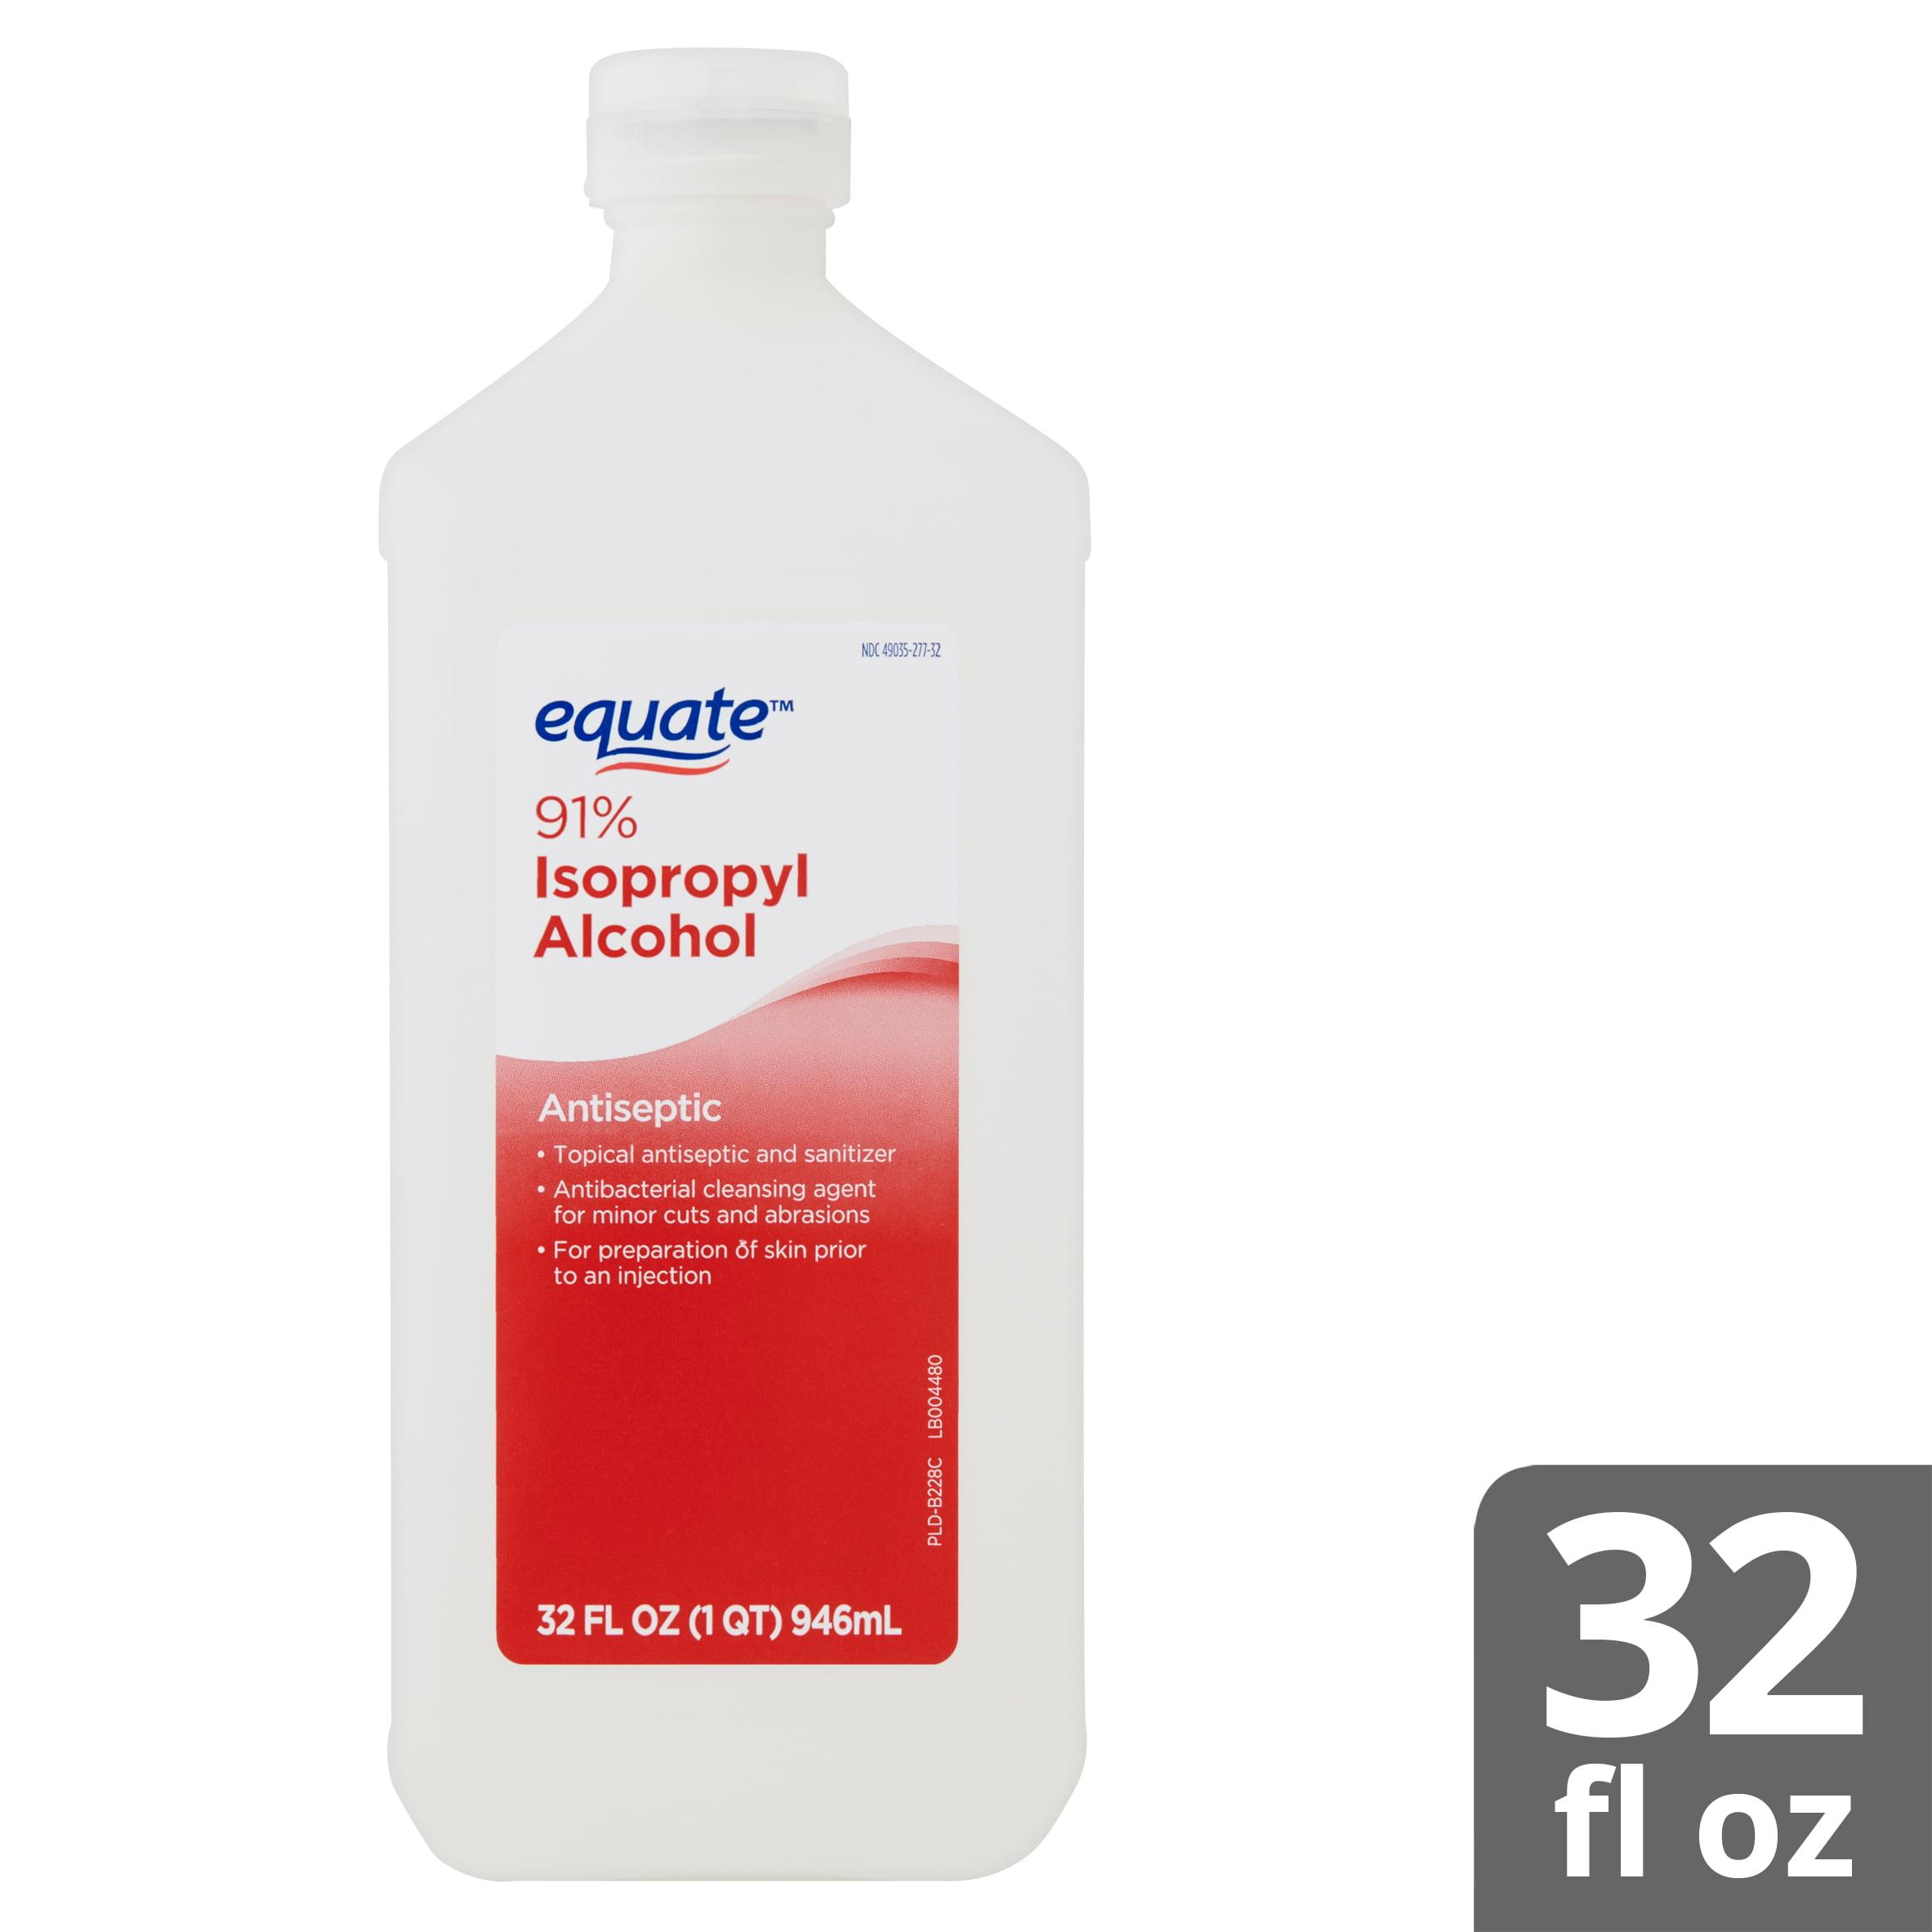 Equate 91% Isopropyl Alcohol Antiseptic, 32 fl oz - Walmart com